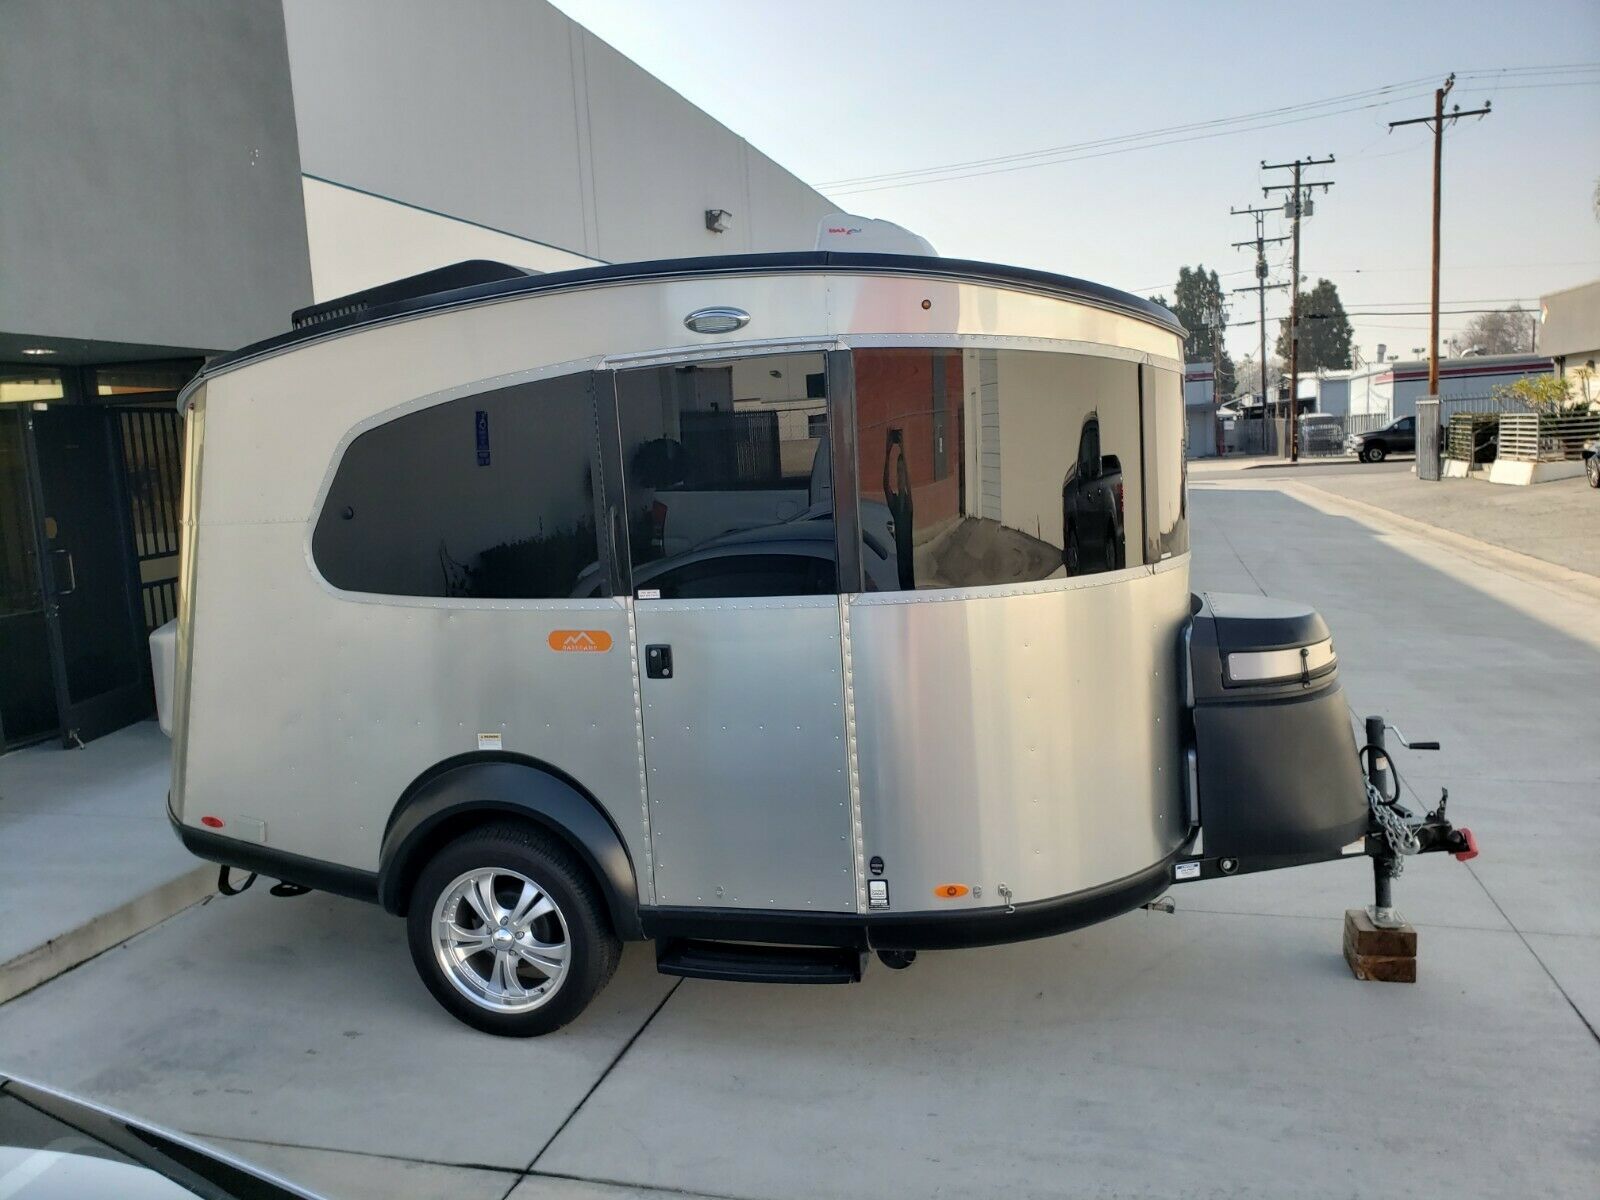 compact 2017 Airstream Basecamp camper